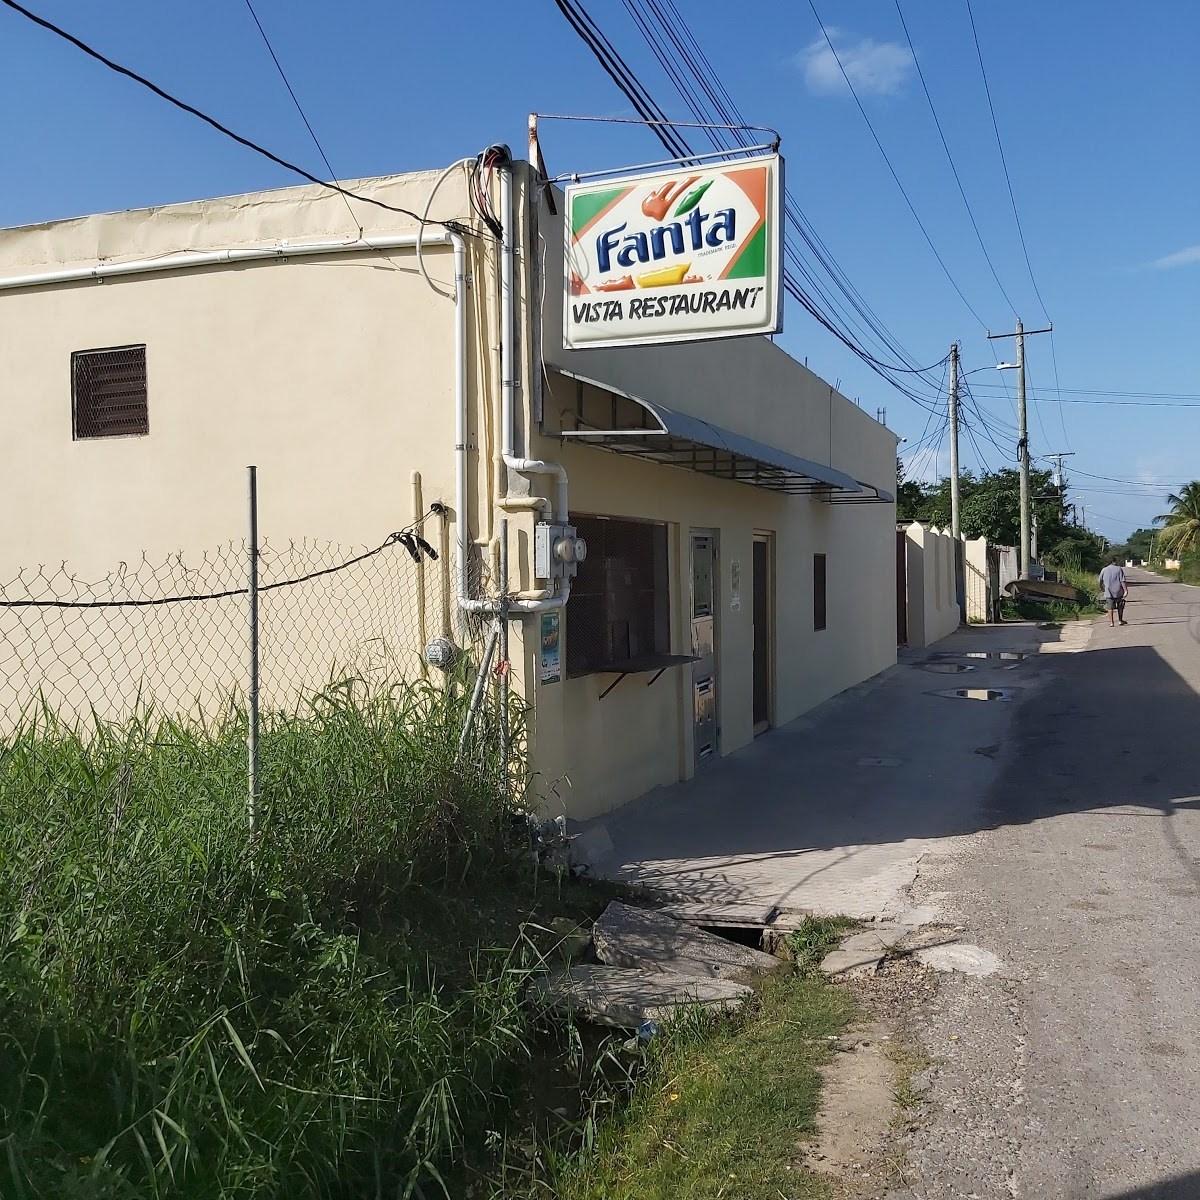 The Vista Restaurant Ladyville